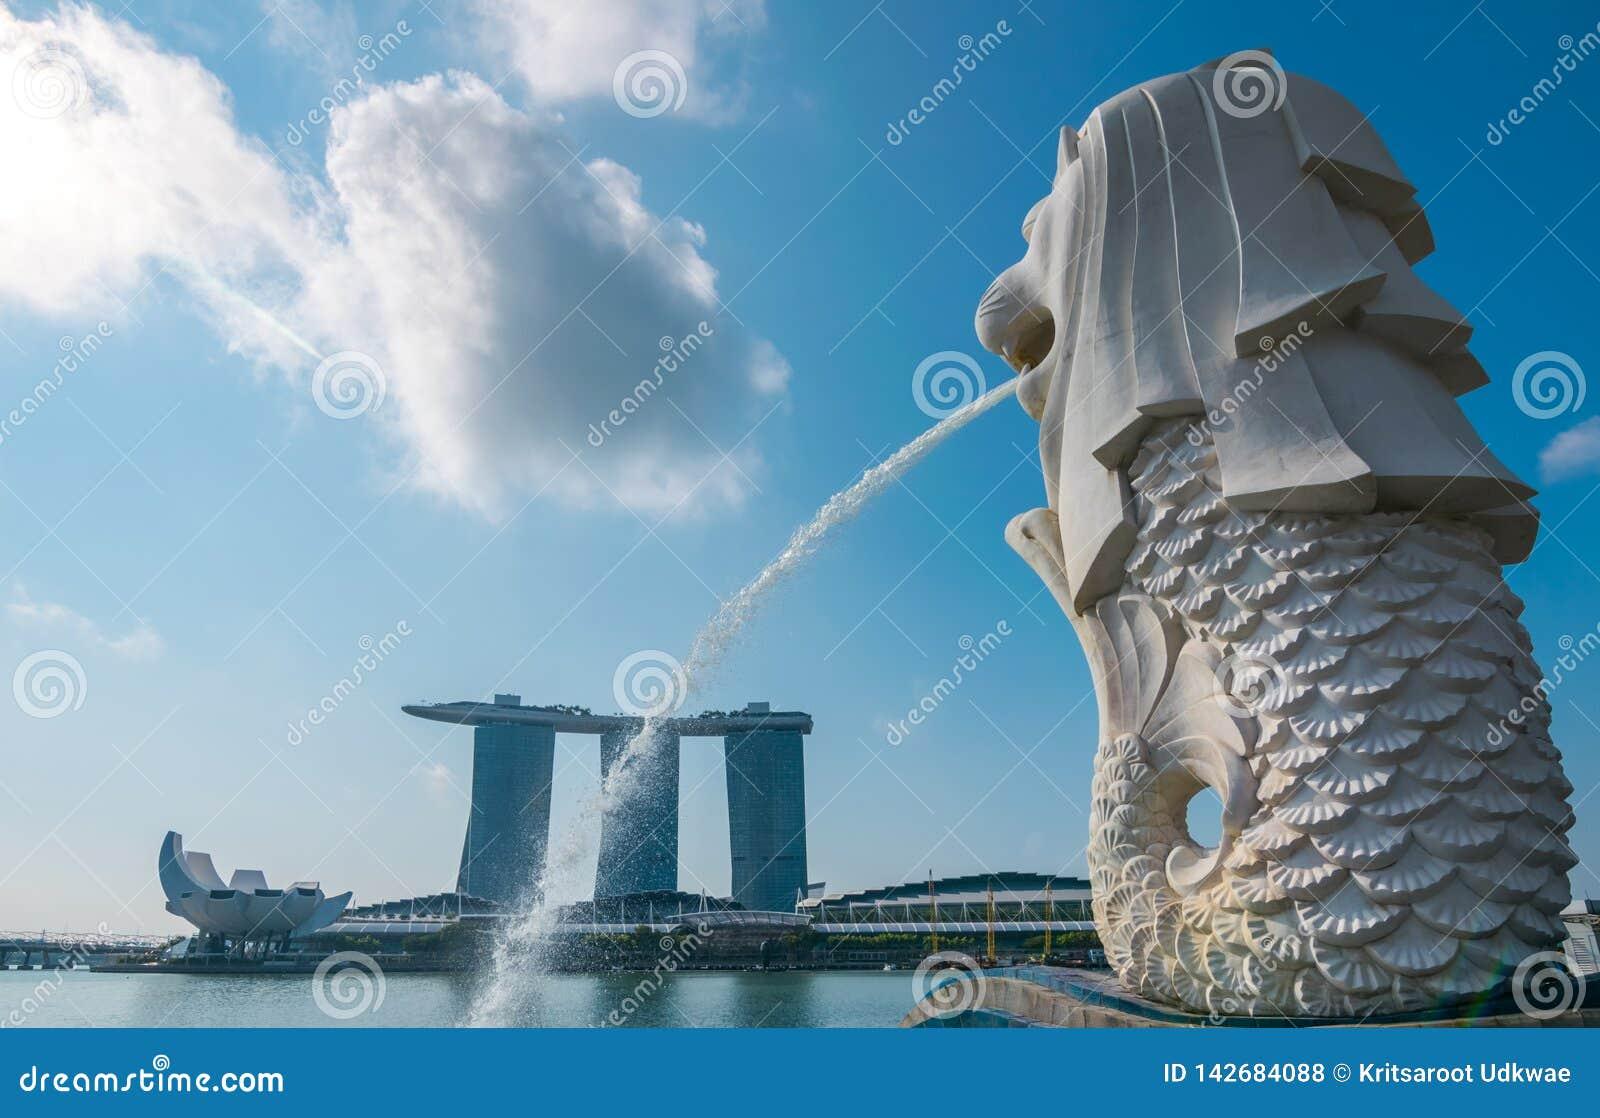 De Merlion-fontein in Singapore